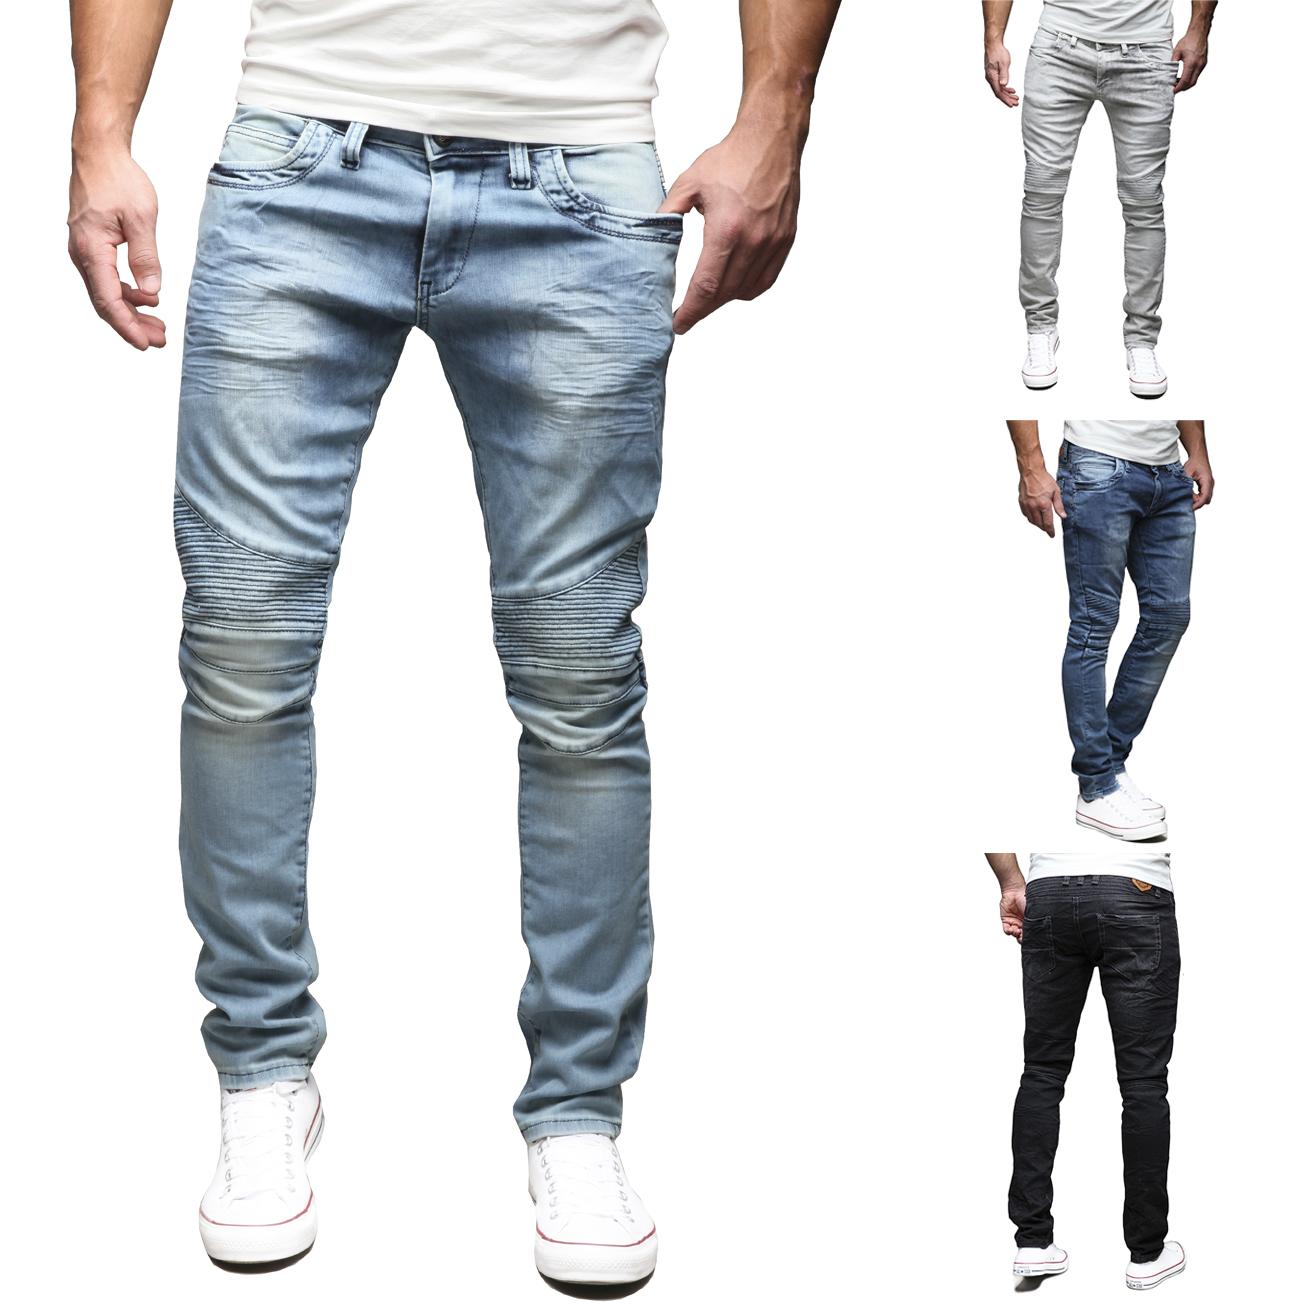 Herren jeans günstig